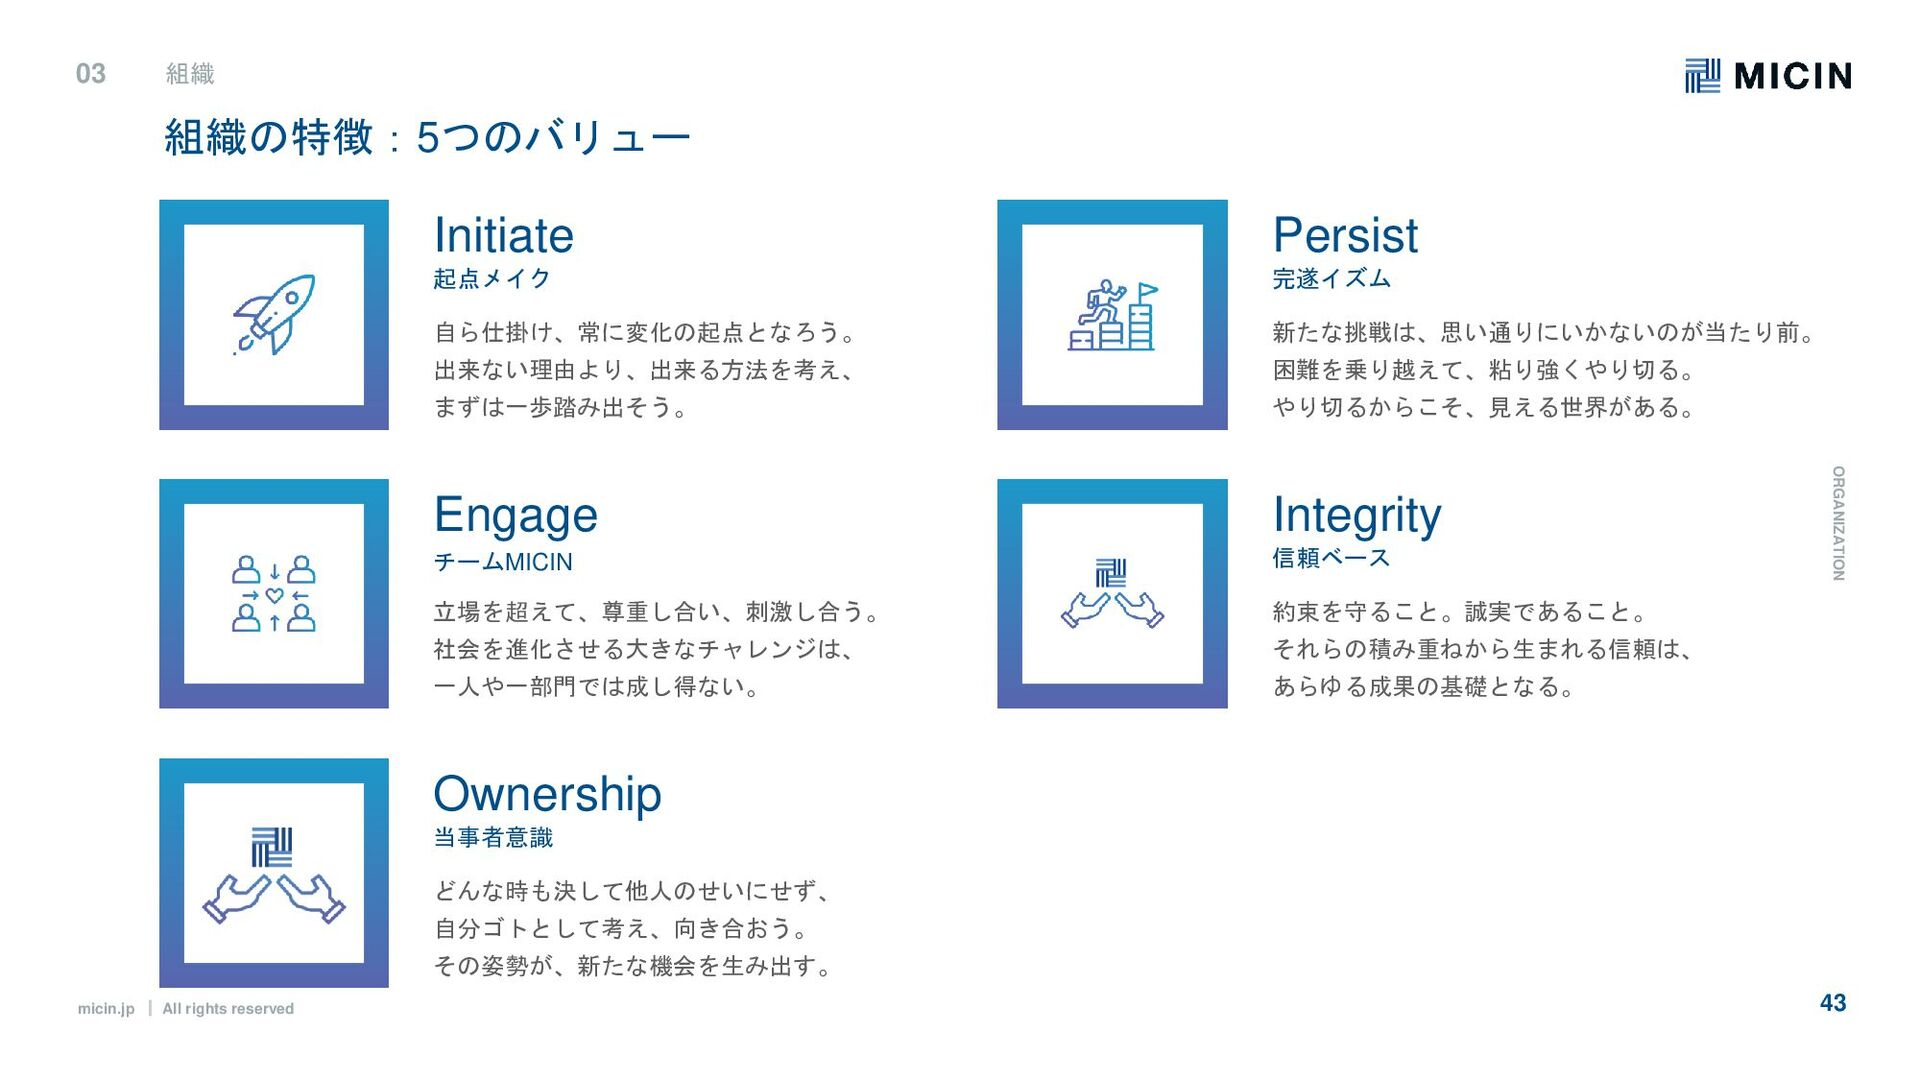 micin.jp ʛ All rights reserved 43 03 O R G A N ...